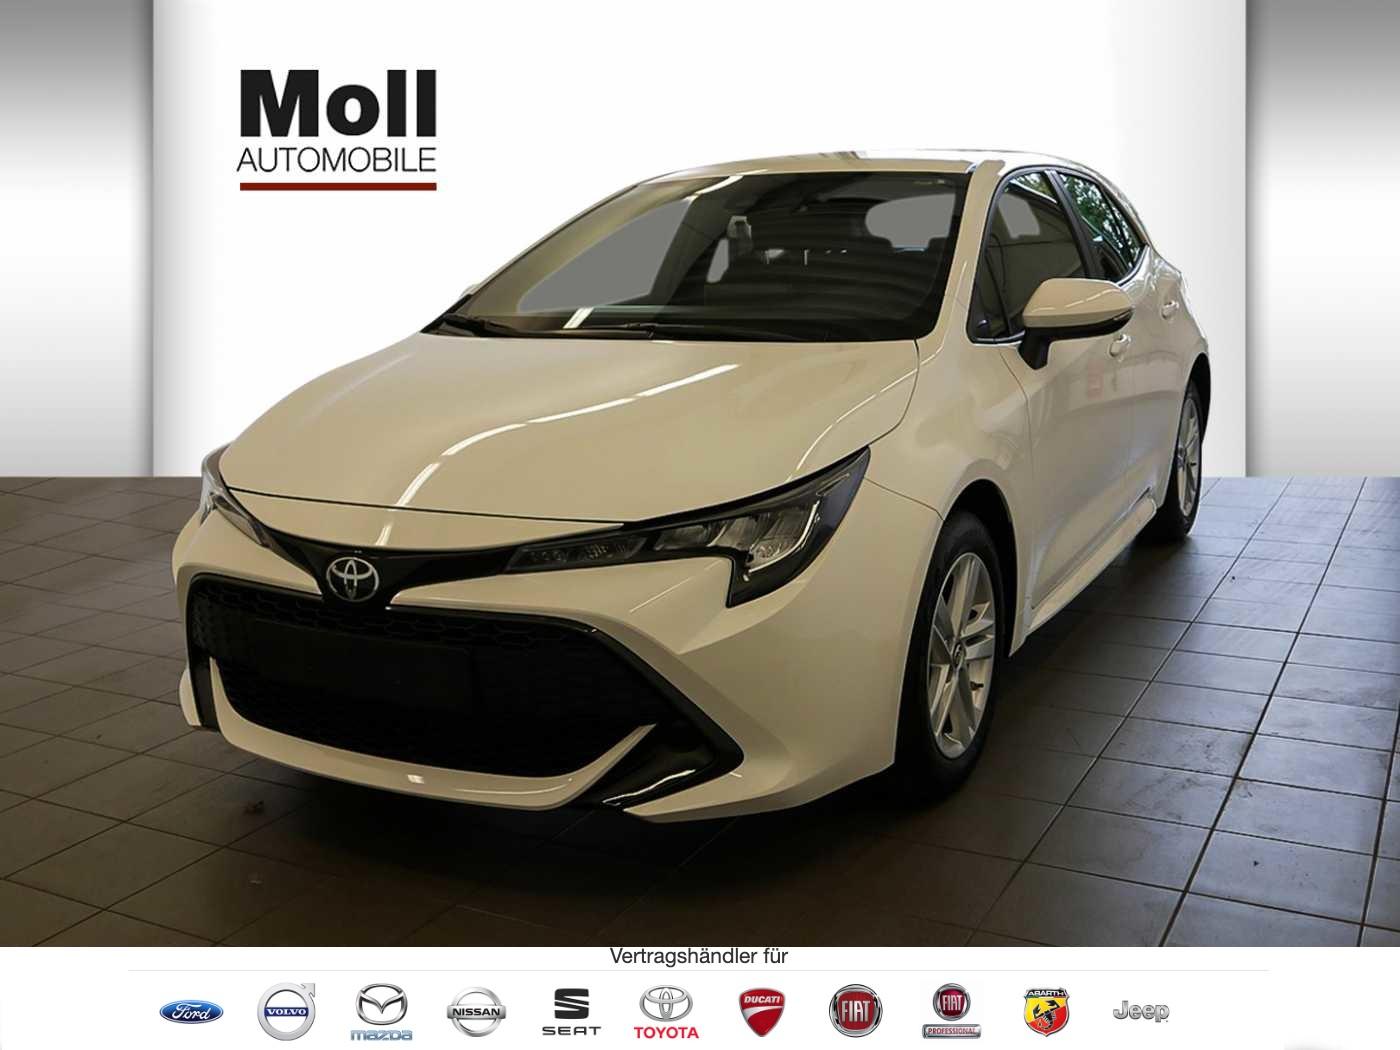 Toyota Corolla 5trg 1.2 Turbo Comfort Neues Modell 2019, Jahr 2019, Benzin